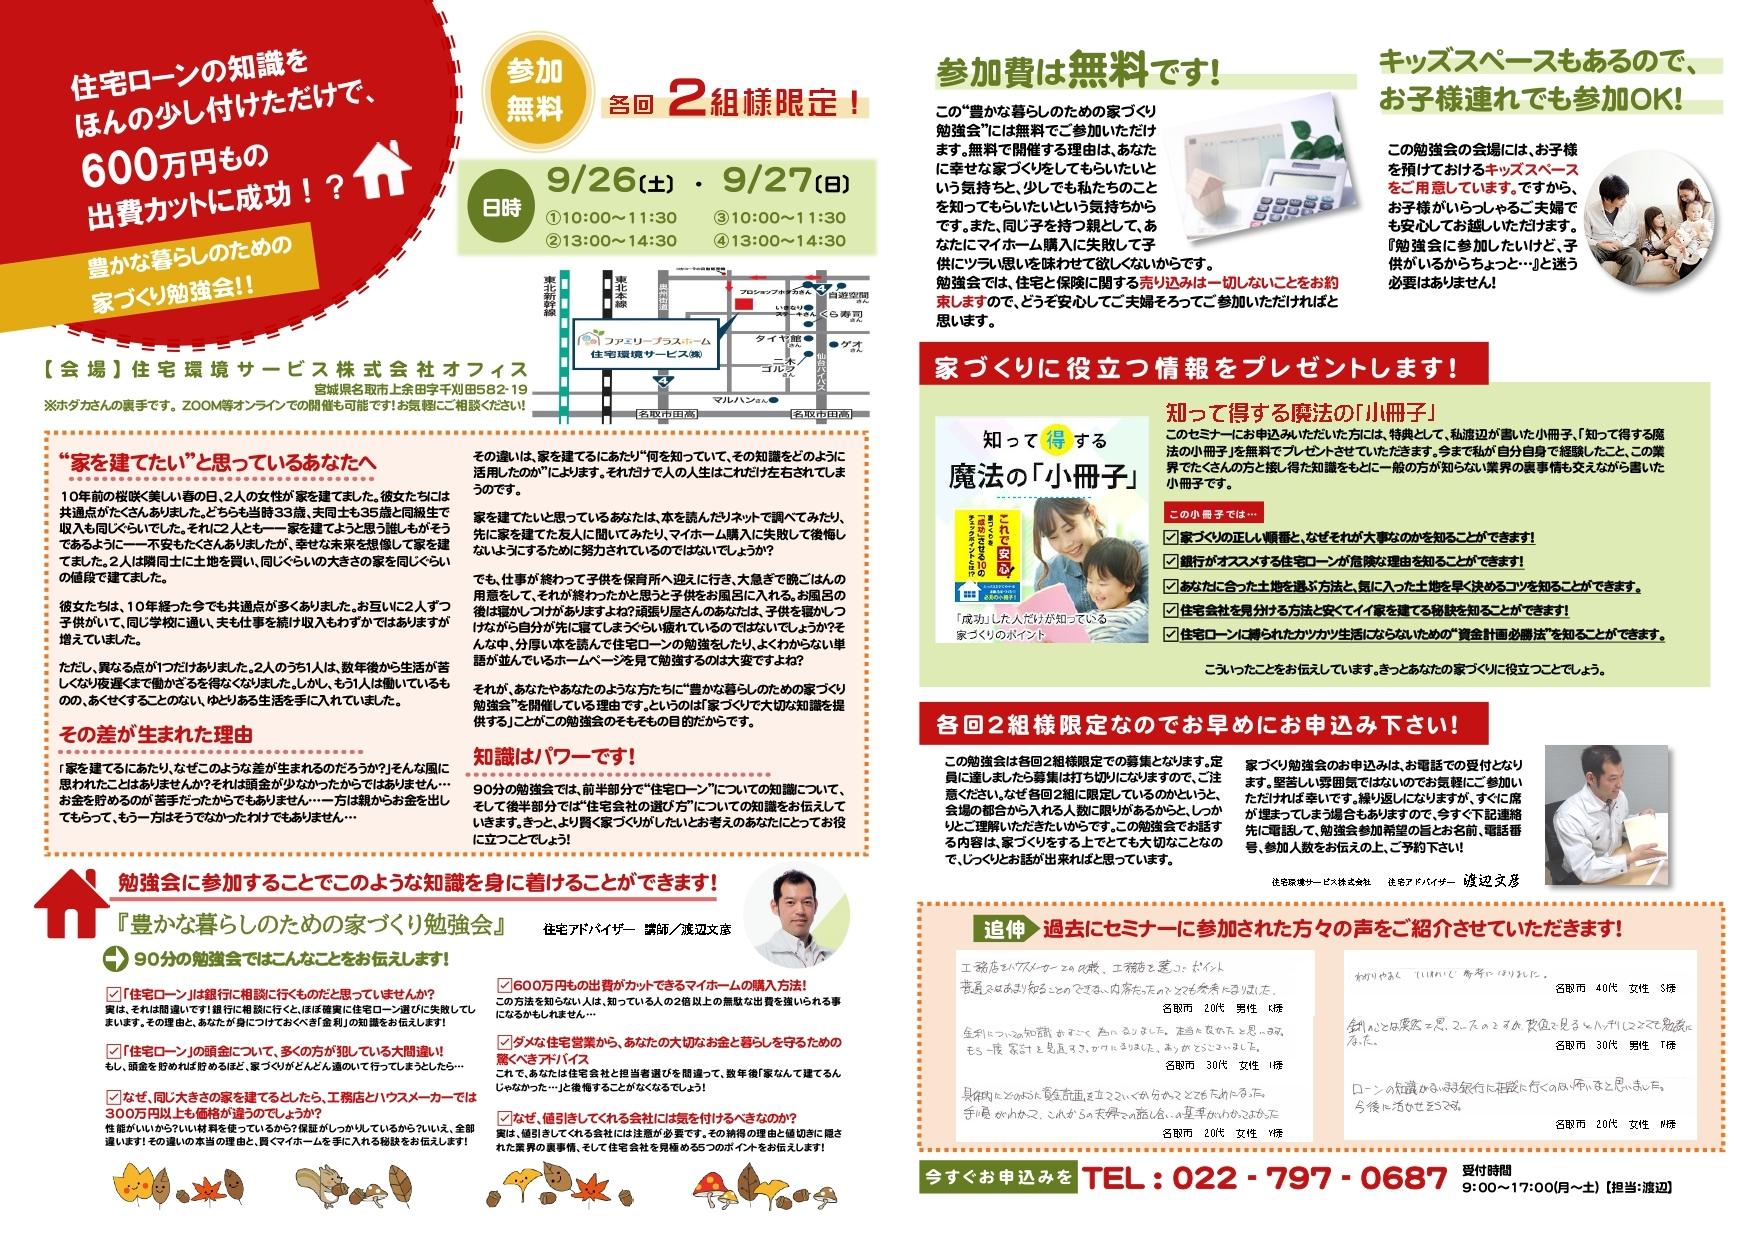 http://www.jutakukankyo-service.jp/899f7a8cf7e53248f8ce16ee4fd6bb73c463e2d5.jpg